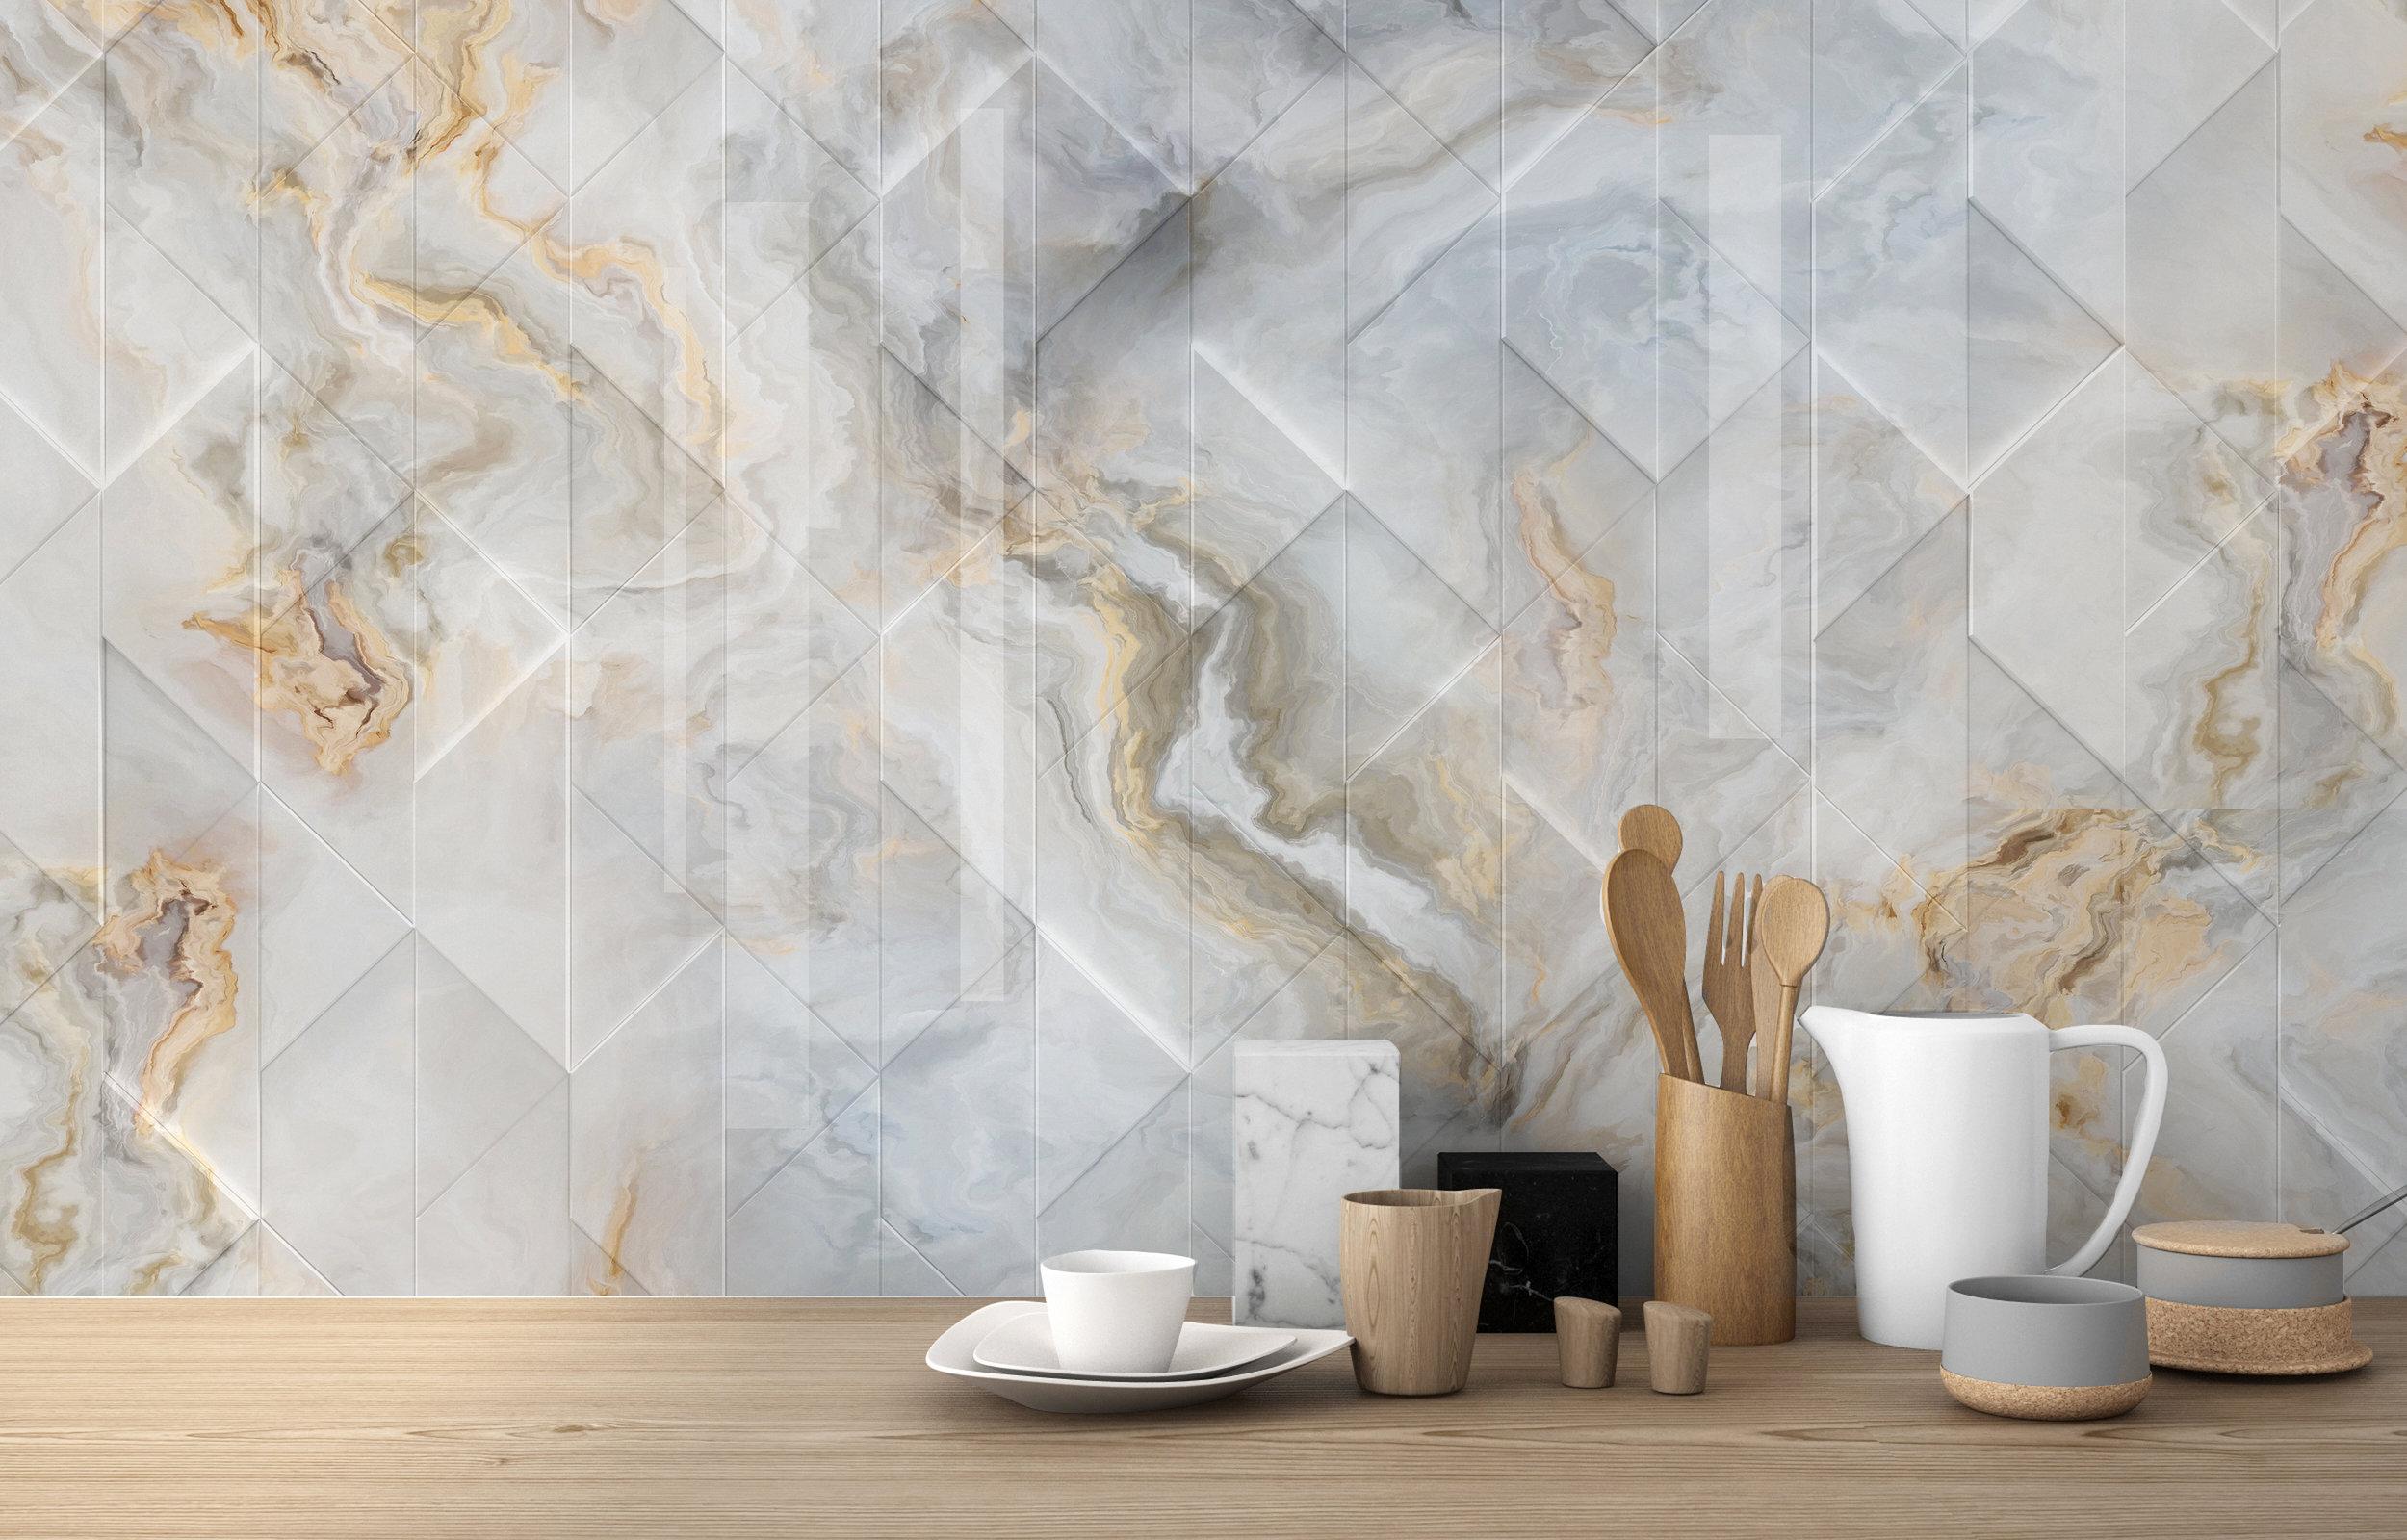 ARCH 2019-1a Marble Gold Vein Geometric glass splashback